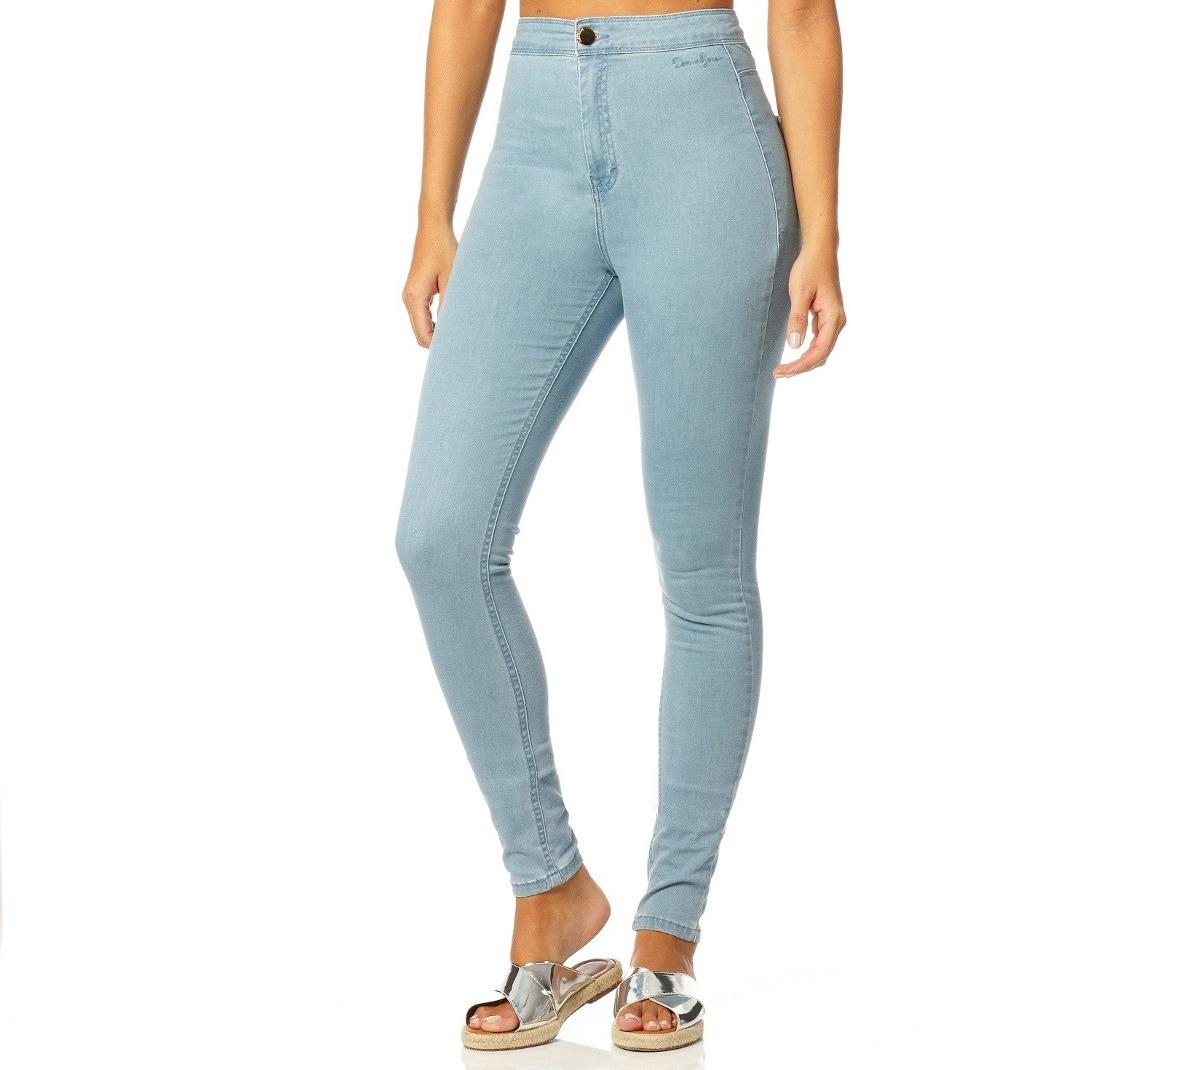 calça feminina skinny hot pants claro denim zero - dz2311. Carregando zoom. 3b1453bffa4